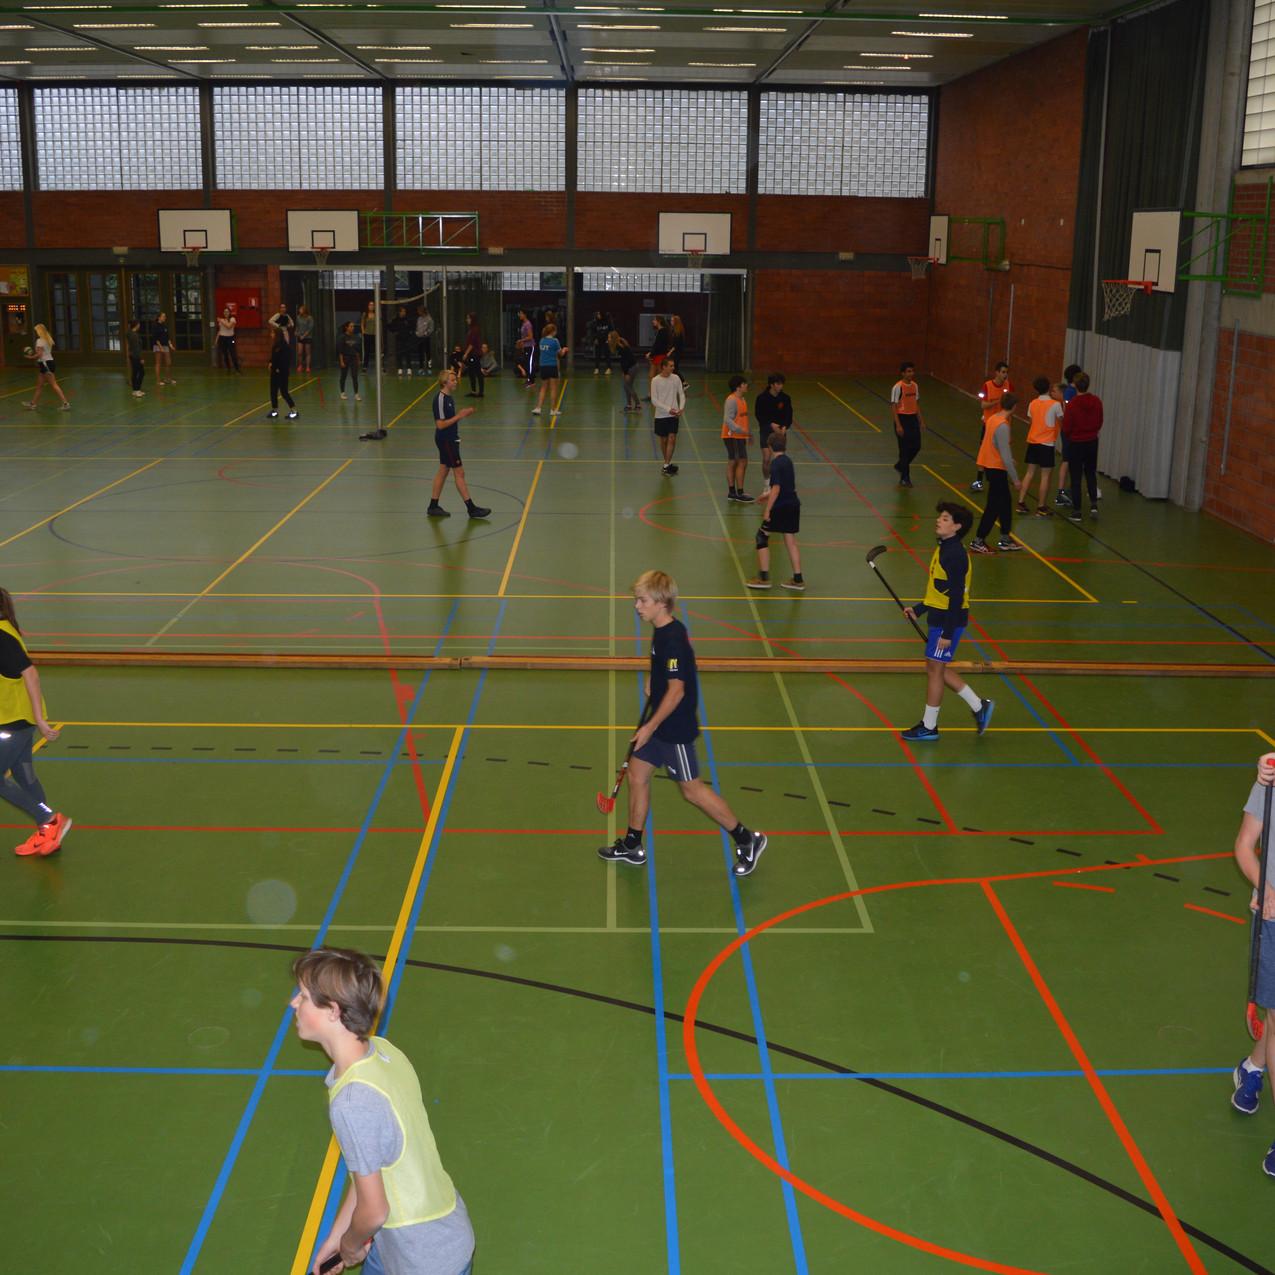 20171207 examensport (6)